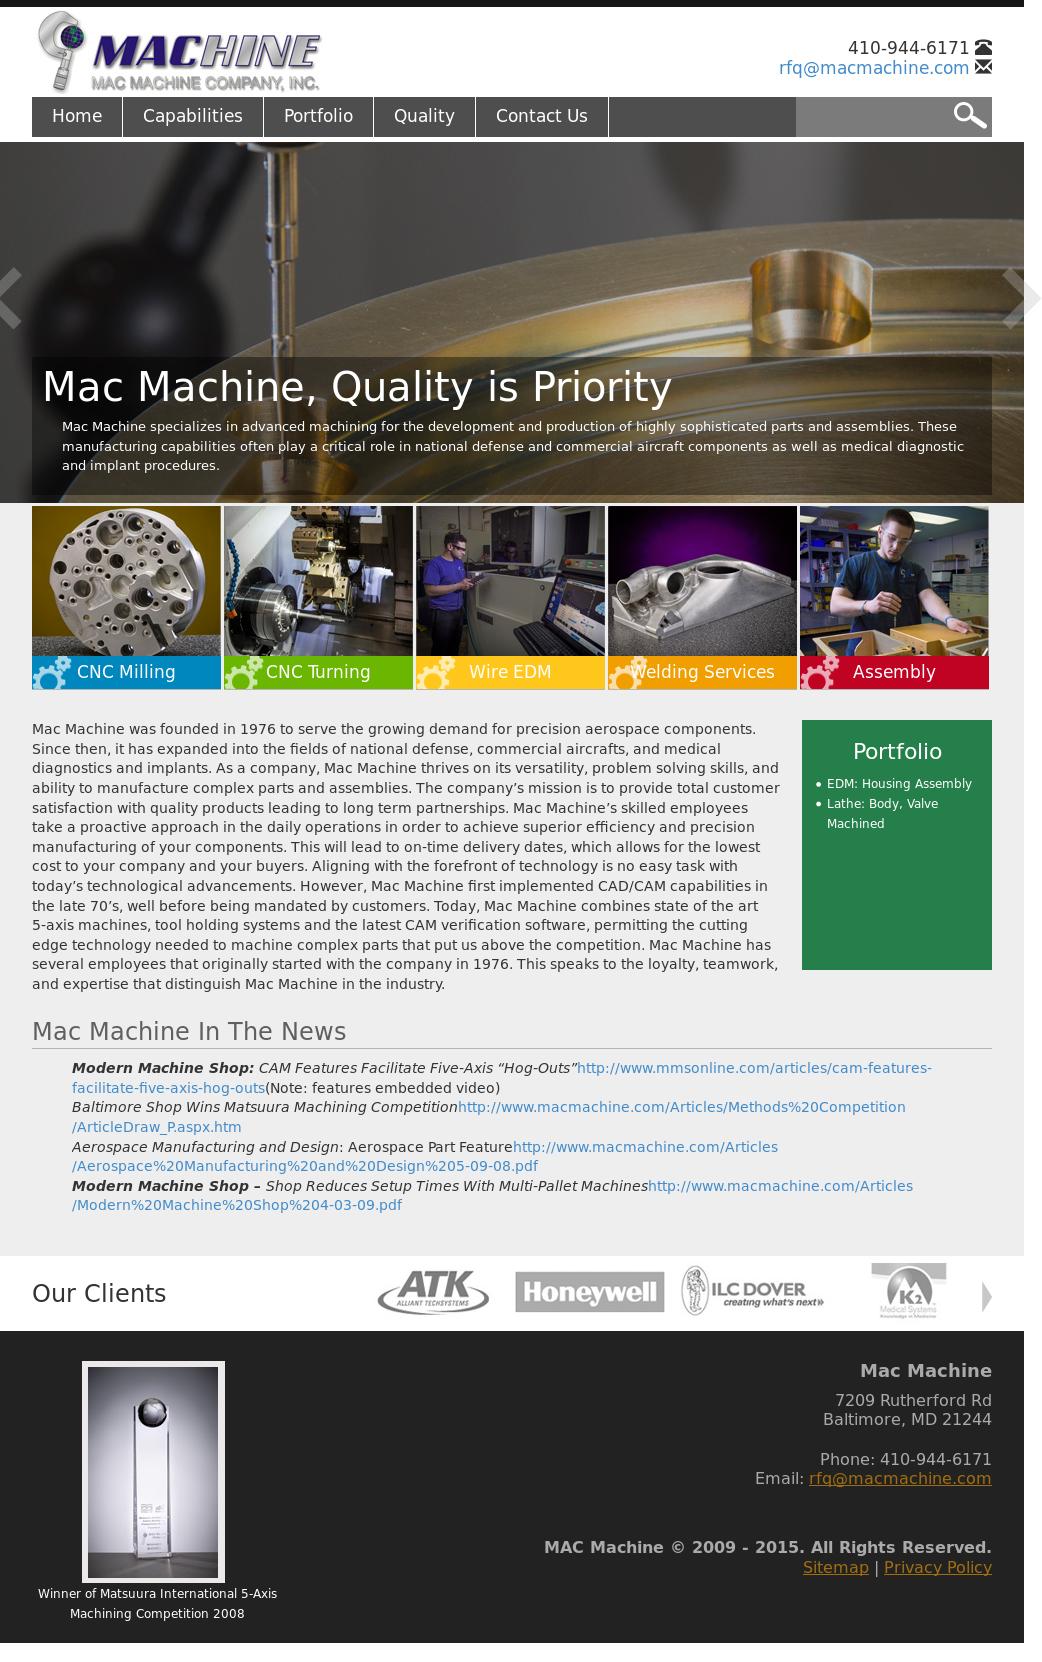 MAC Machine Competitors, Revenue and Employees - Owler Company Profile